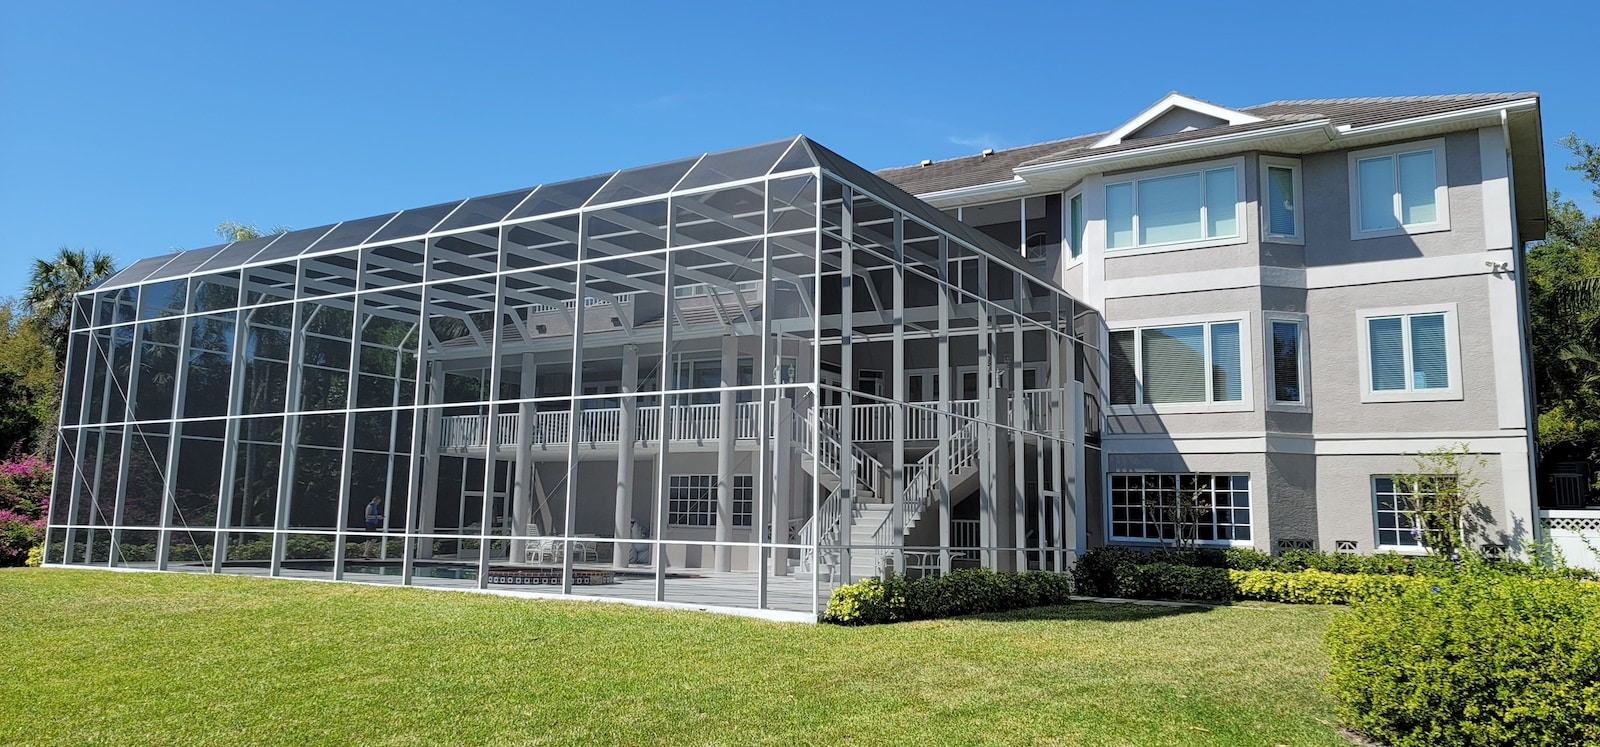 Pool Cage Rescreening